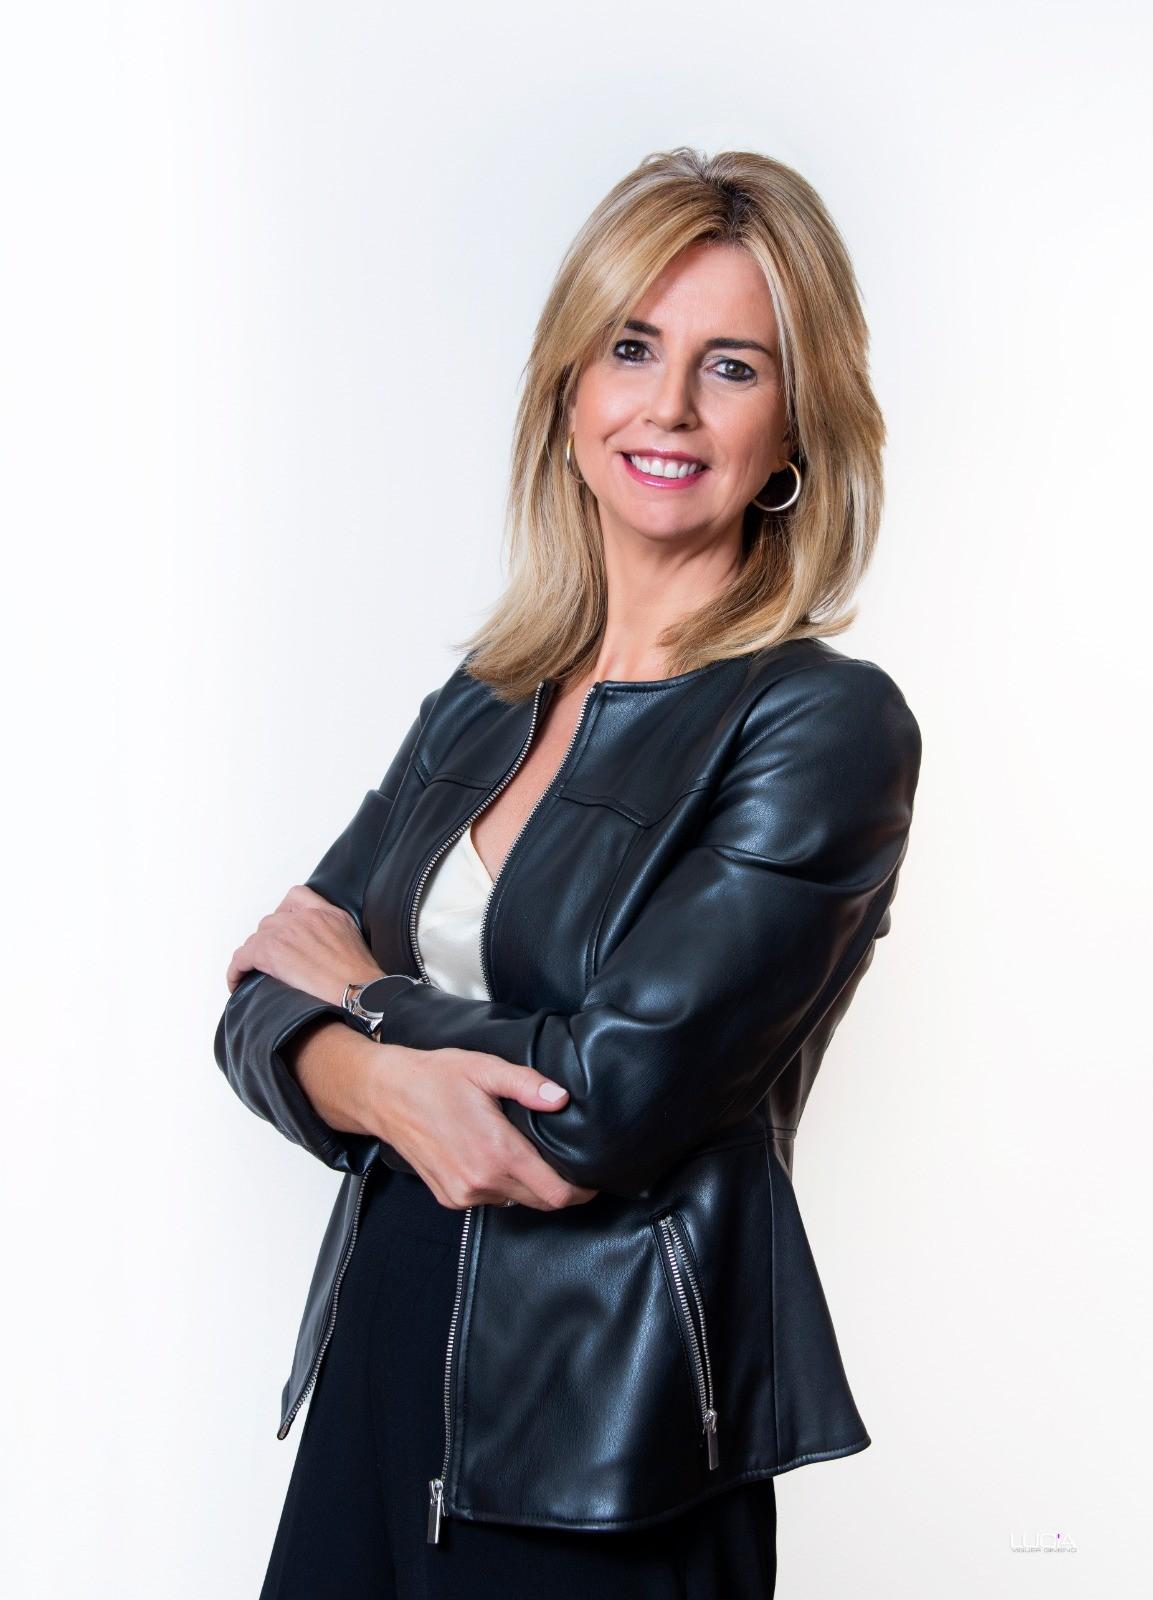 Alicia Amer Martín